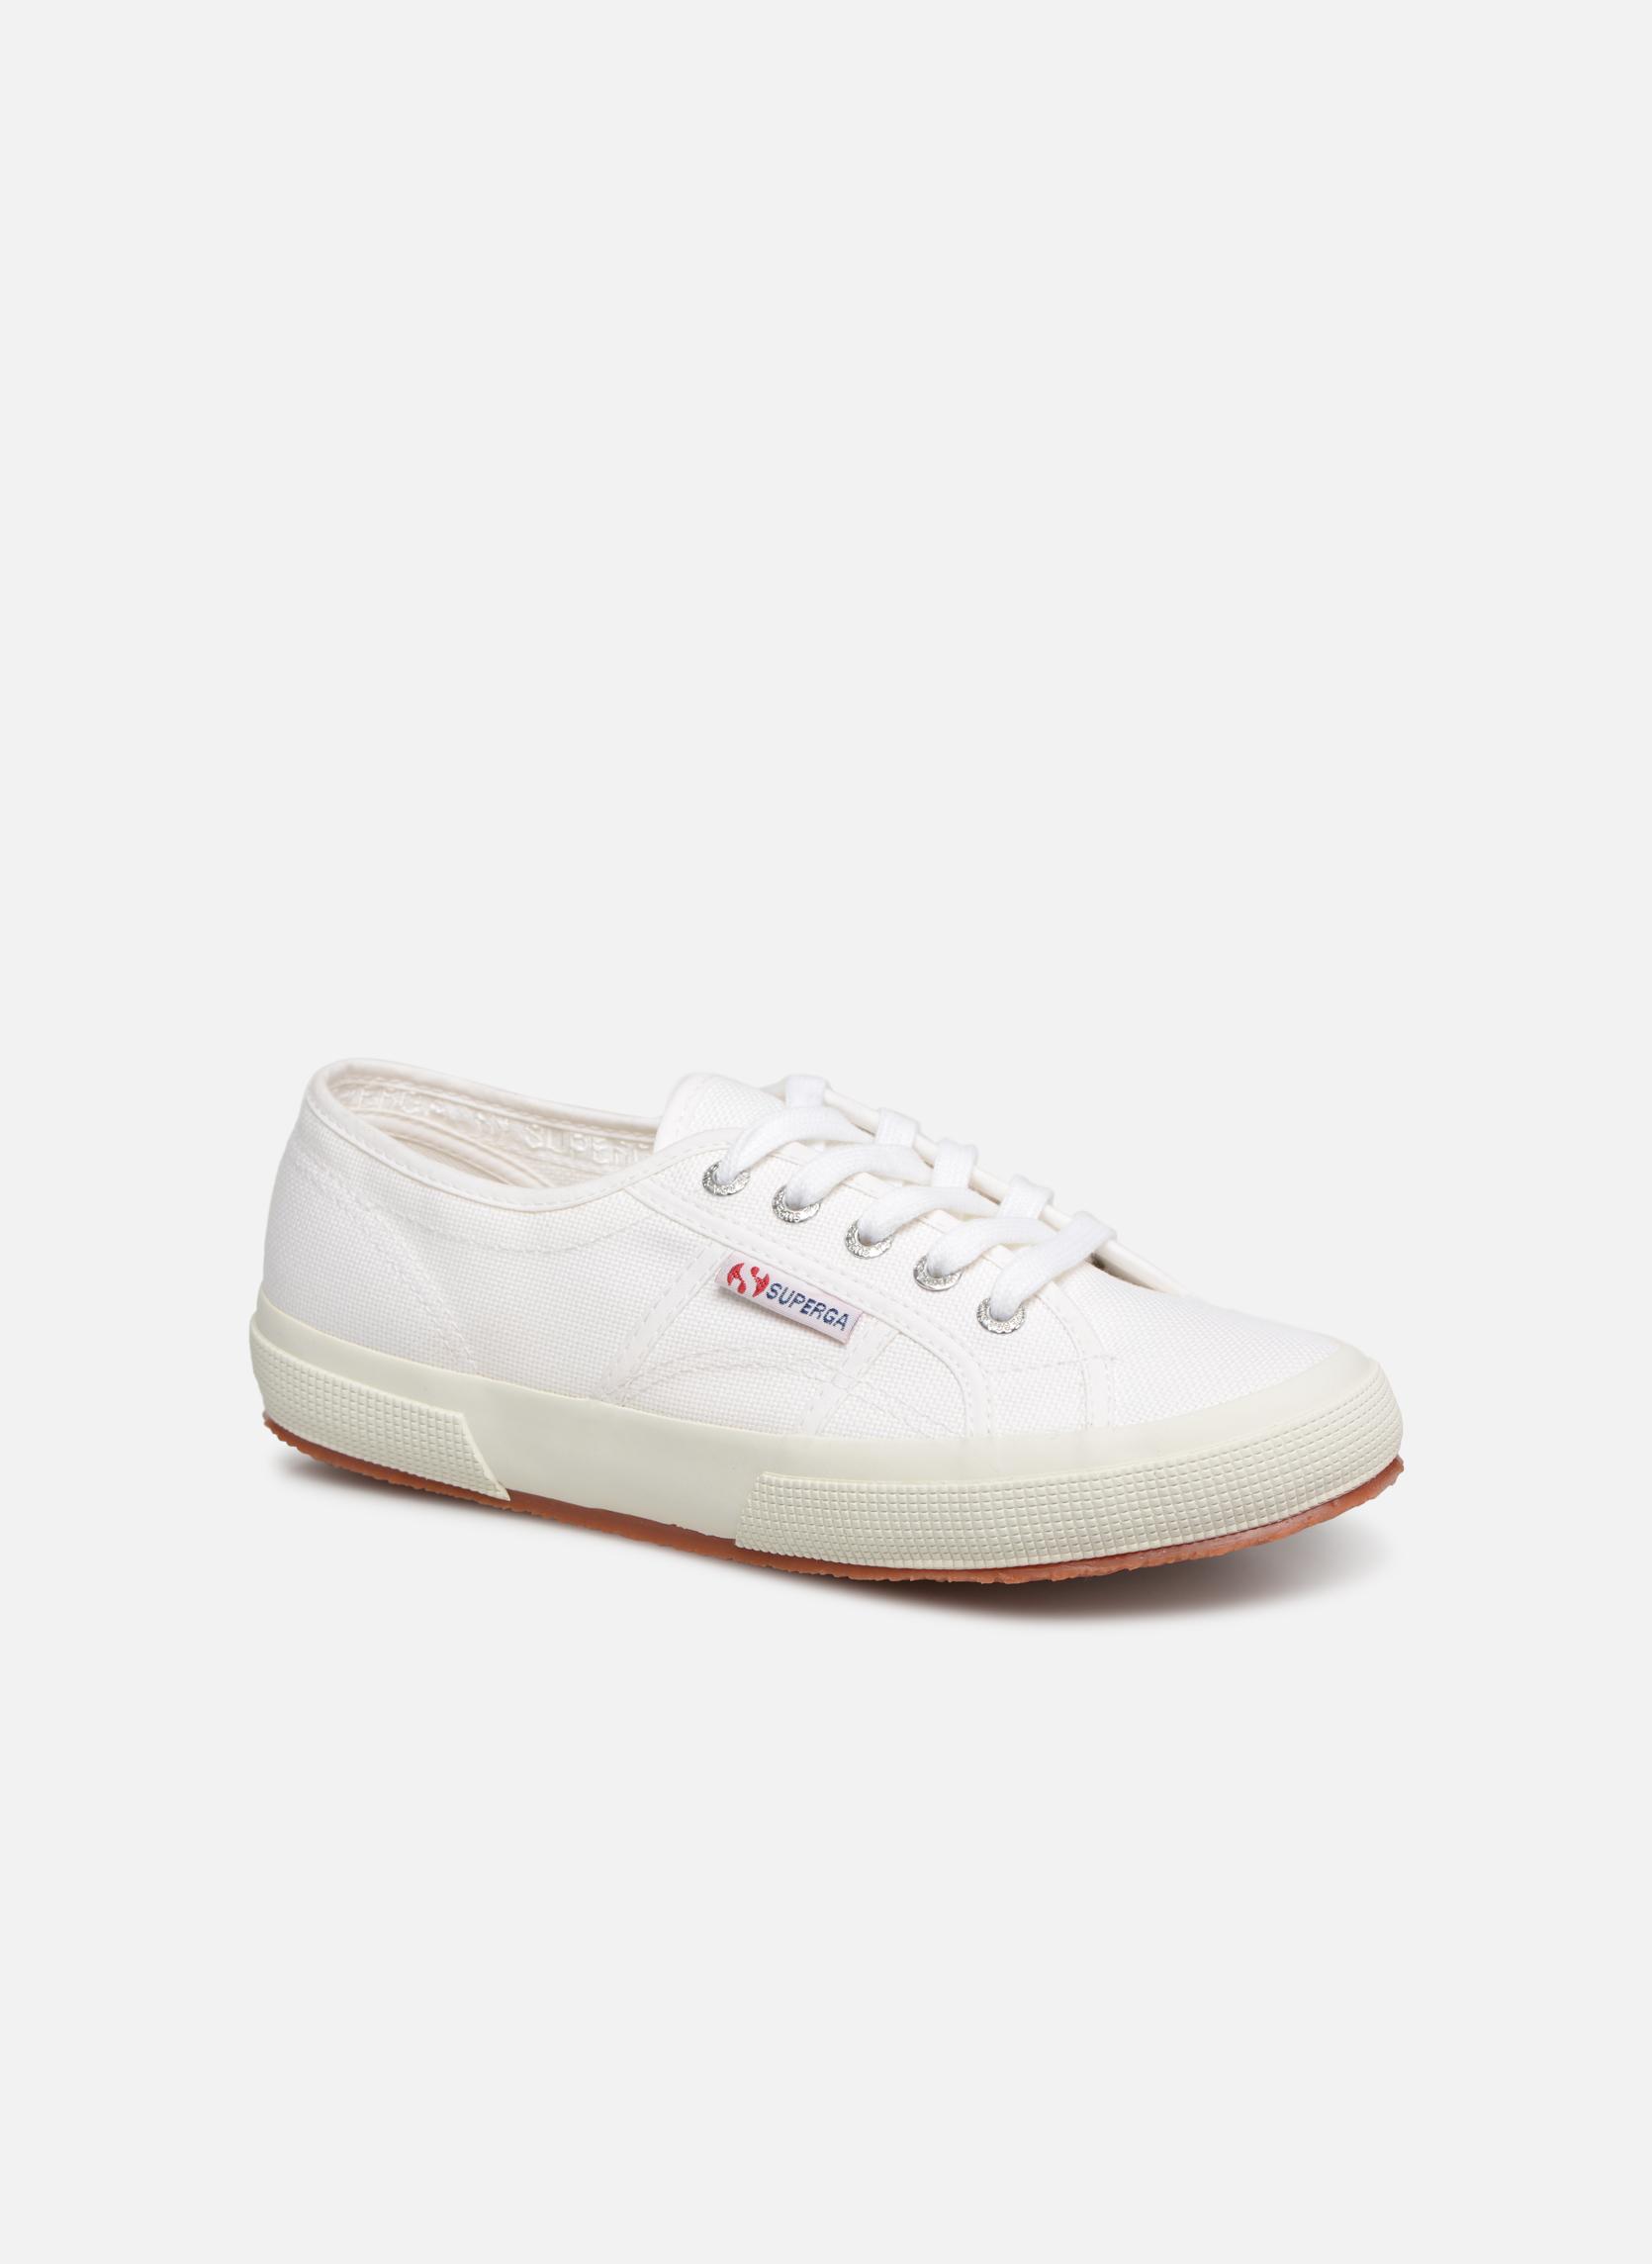 Femmes Sneaker 2730-cotu, Superga Blanc